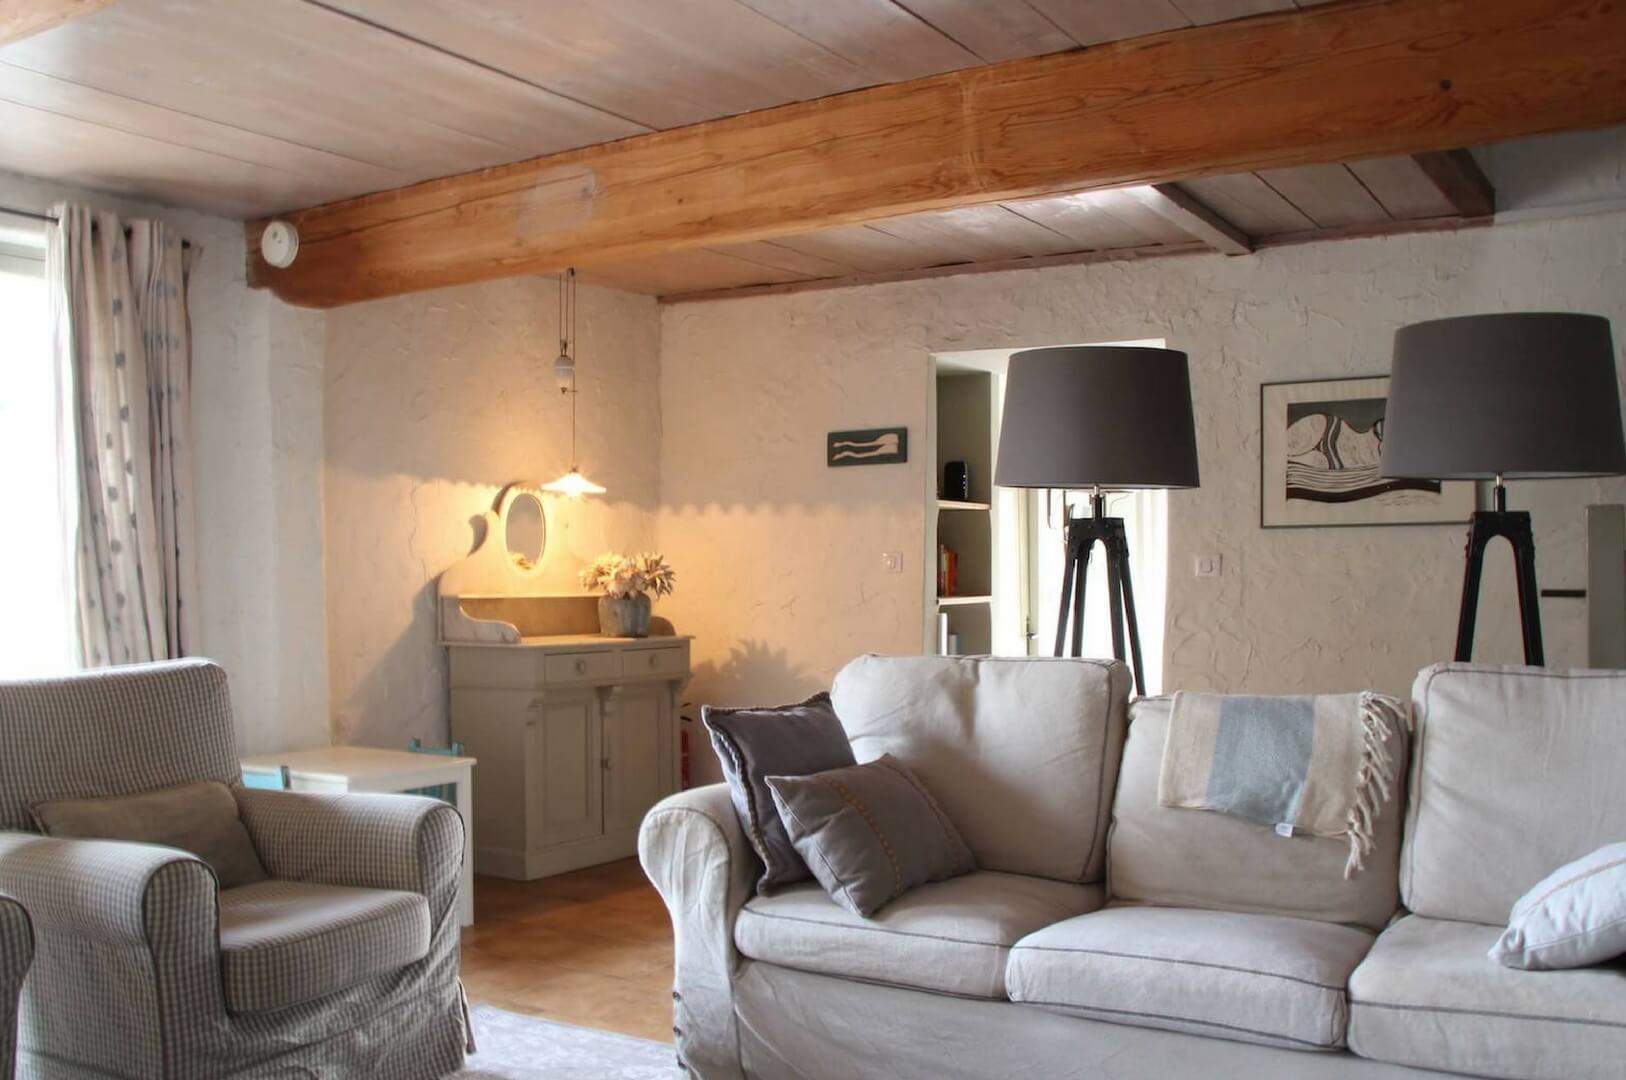 Domaine serre long i 4 charmante und authentische ferienhäuser